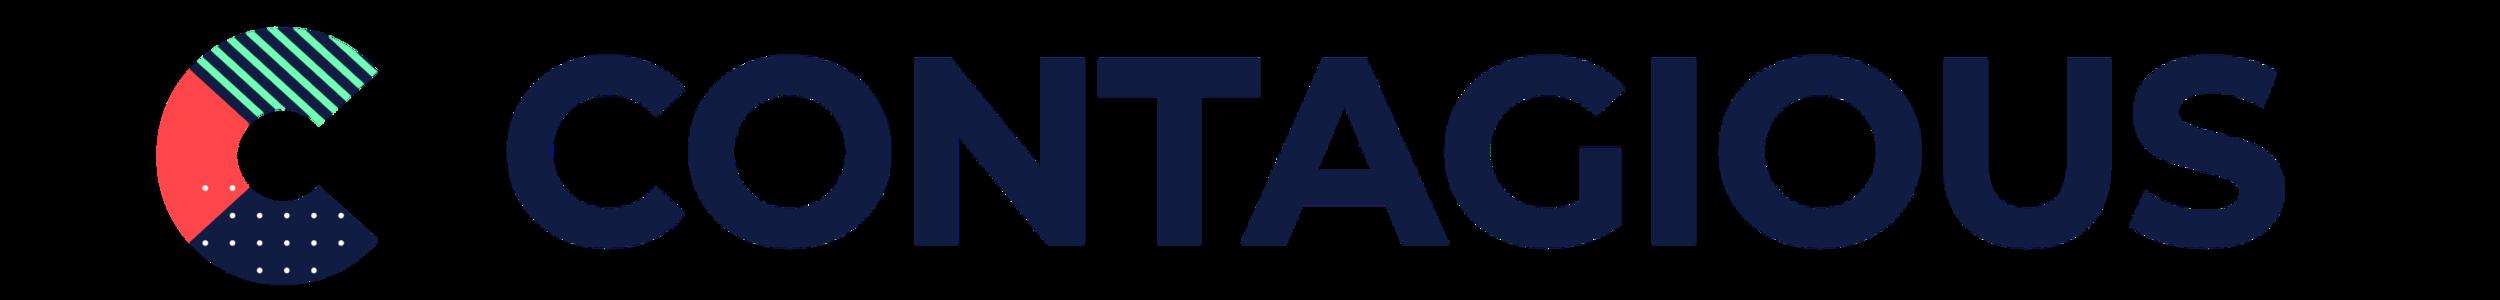 CONTAGIOUS-logo-250x30-ratio.png